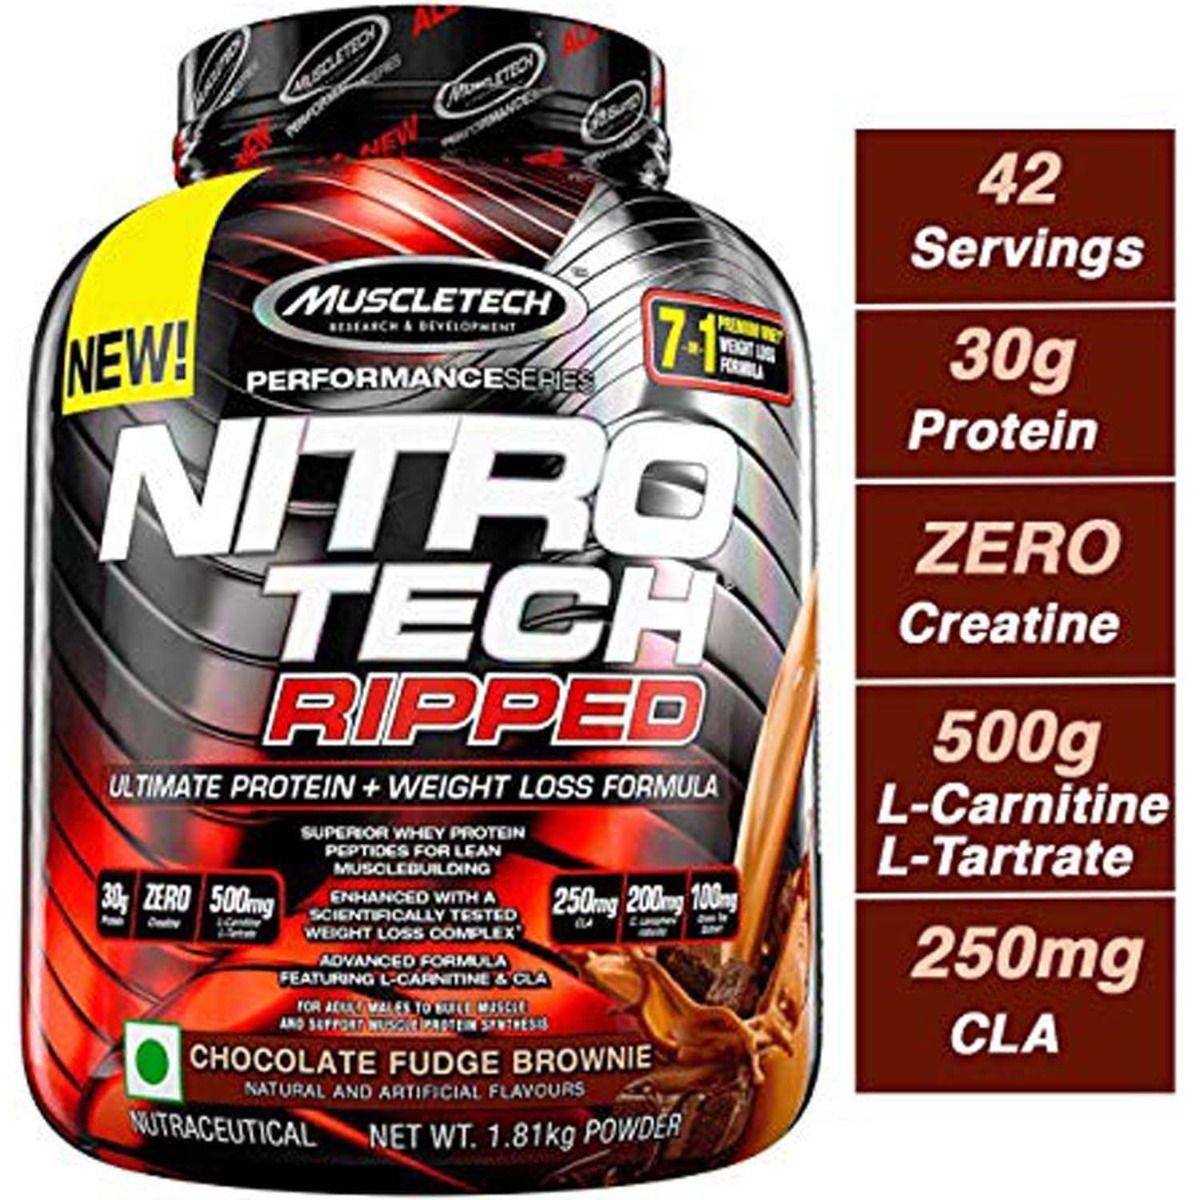 Muscletech Nitrotech Ripped Chocolate Fudge Brownie 4 lb